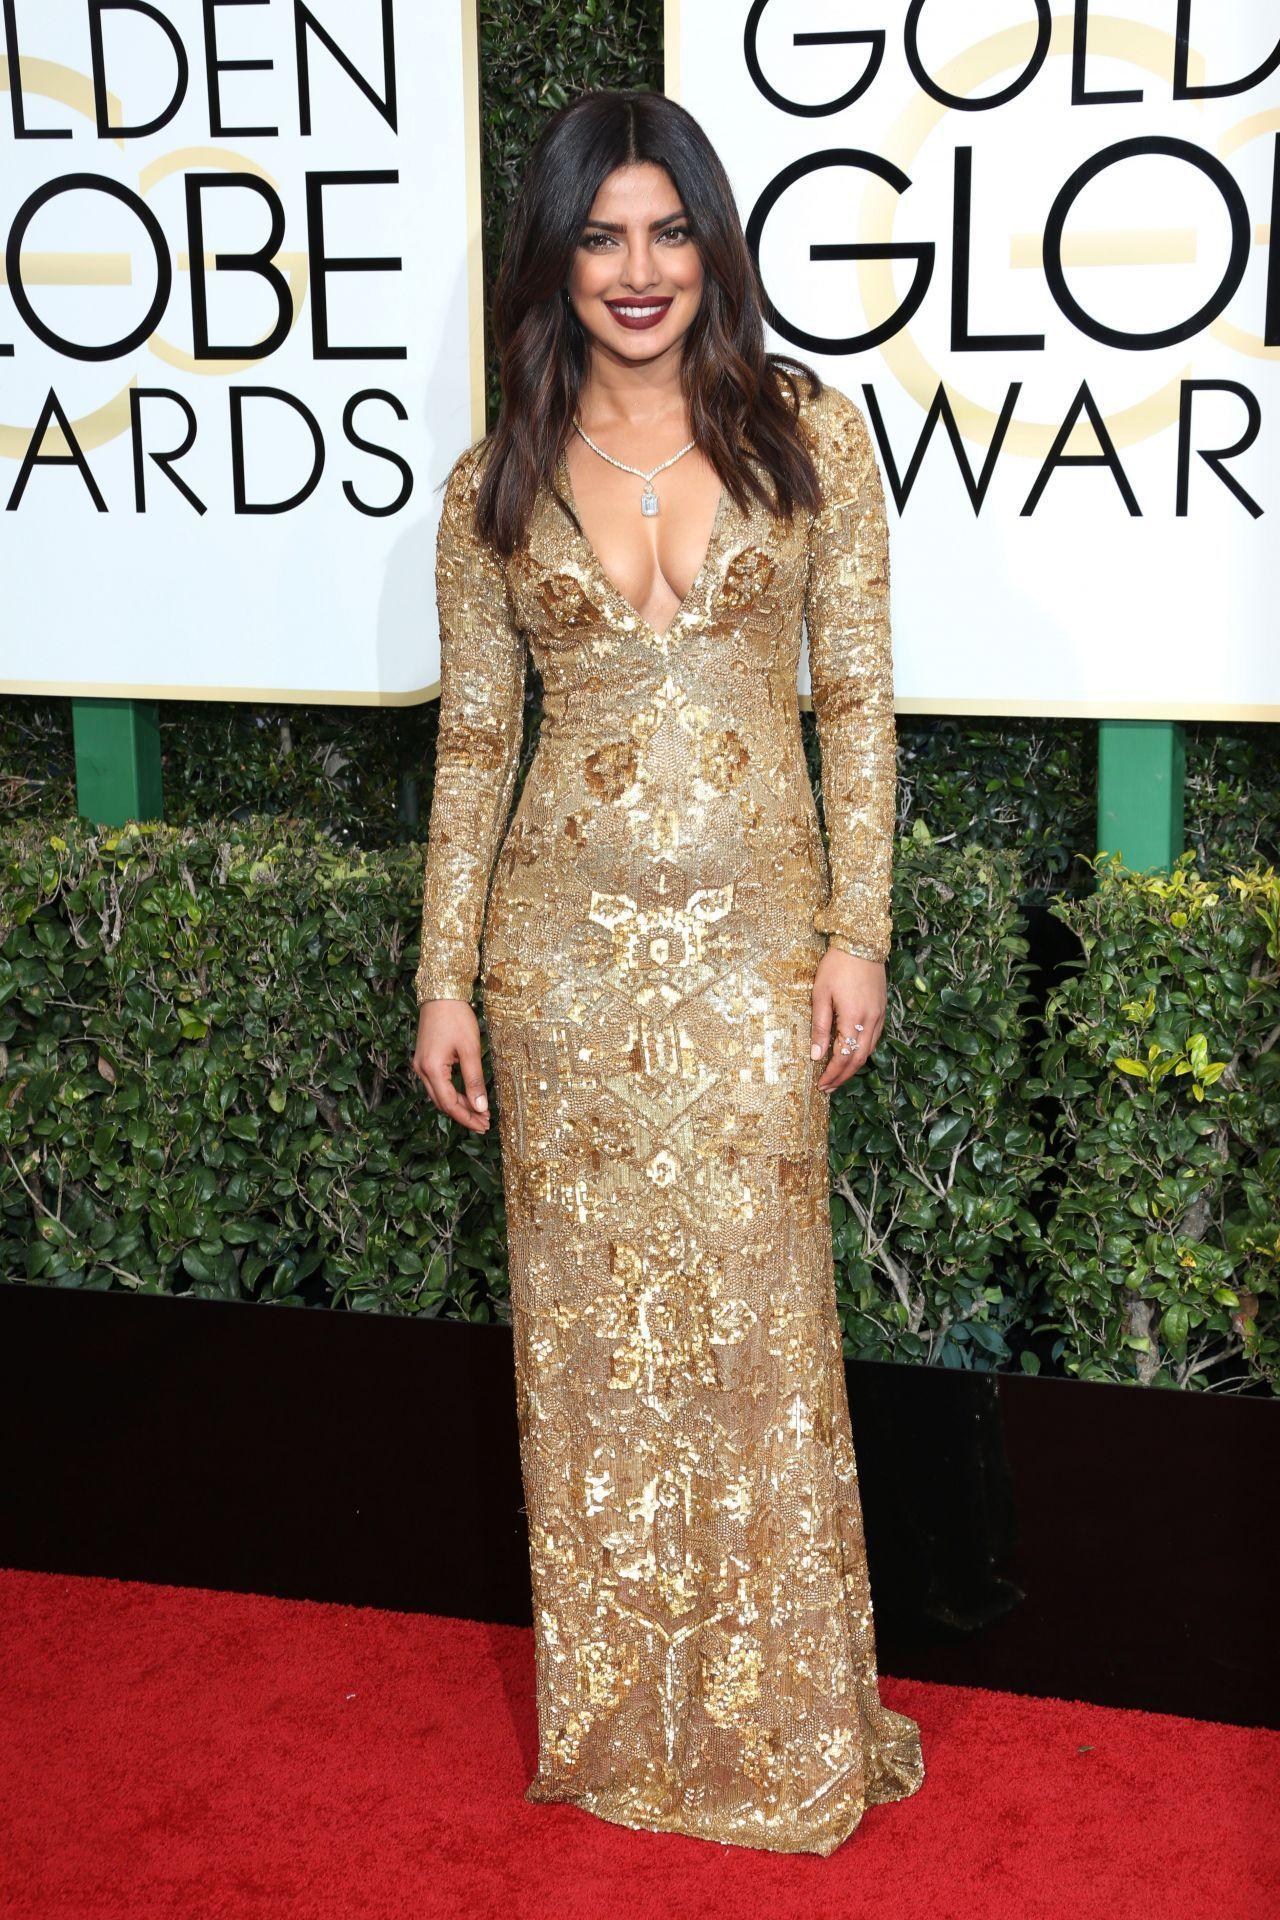 Gaya Seksi Artis Hollywood Pakai Dress Emas, Sensual yang Mahal!